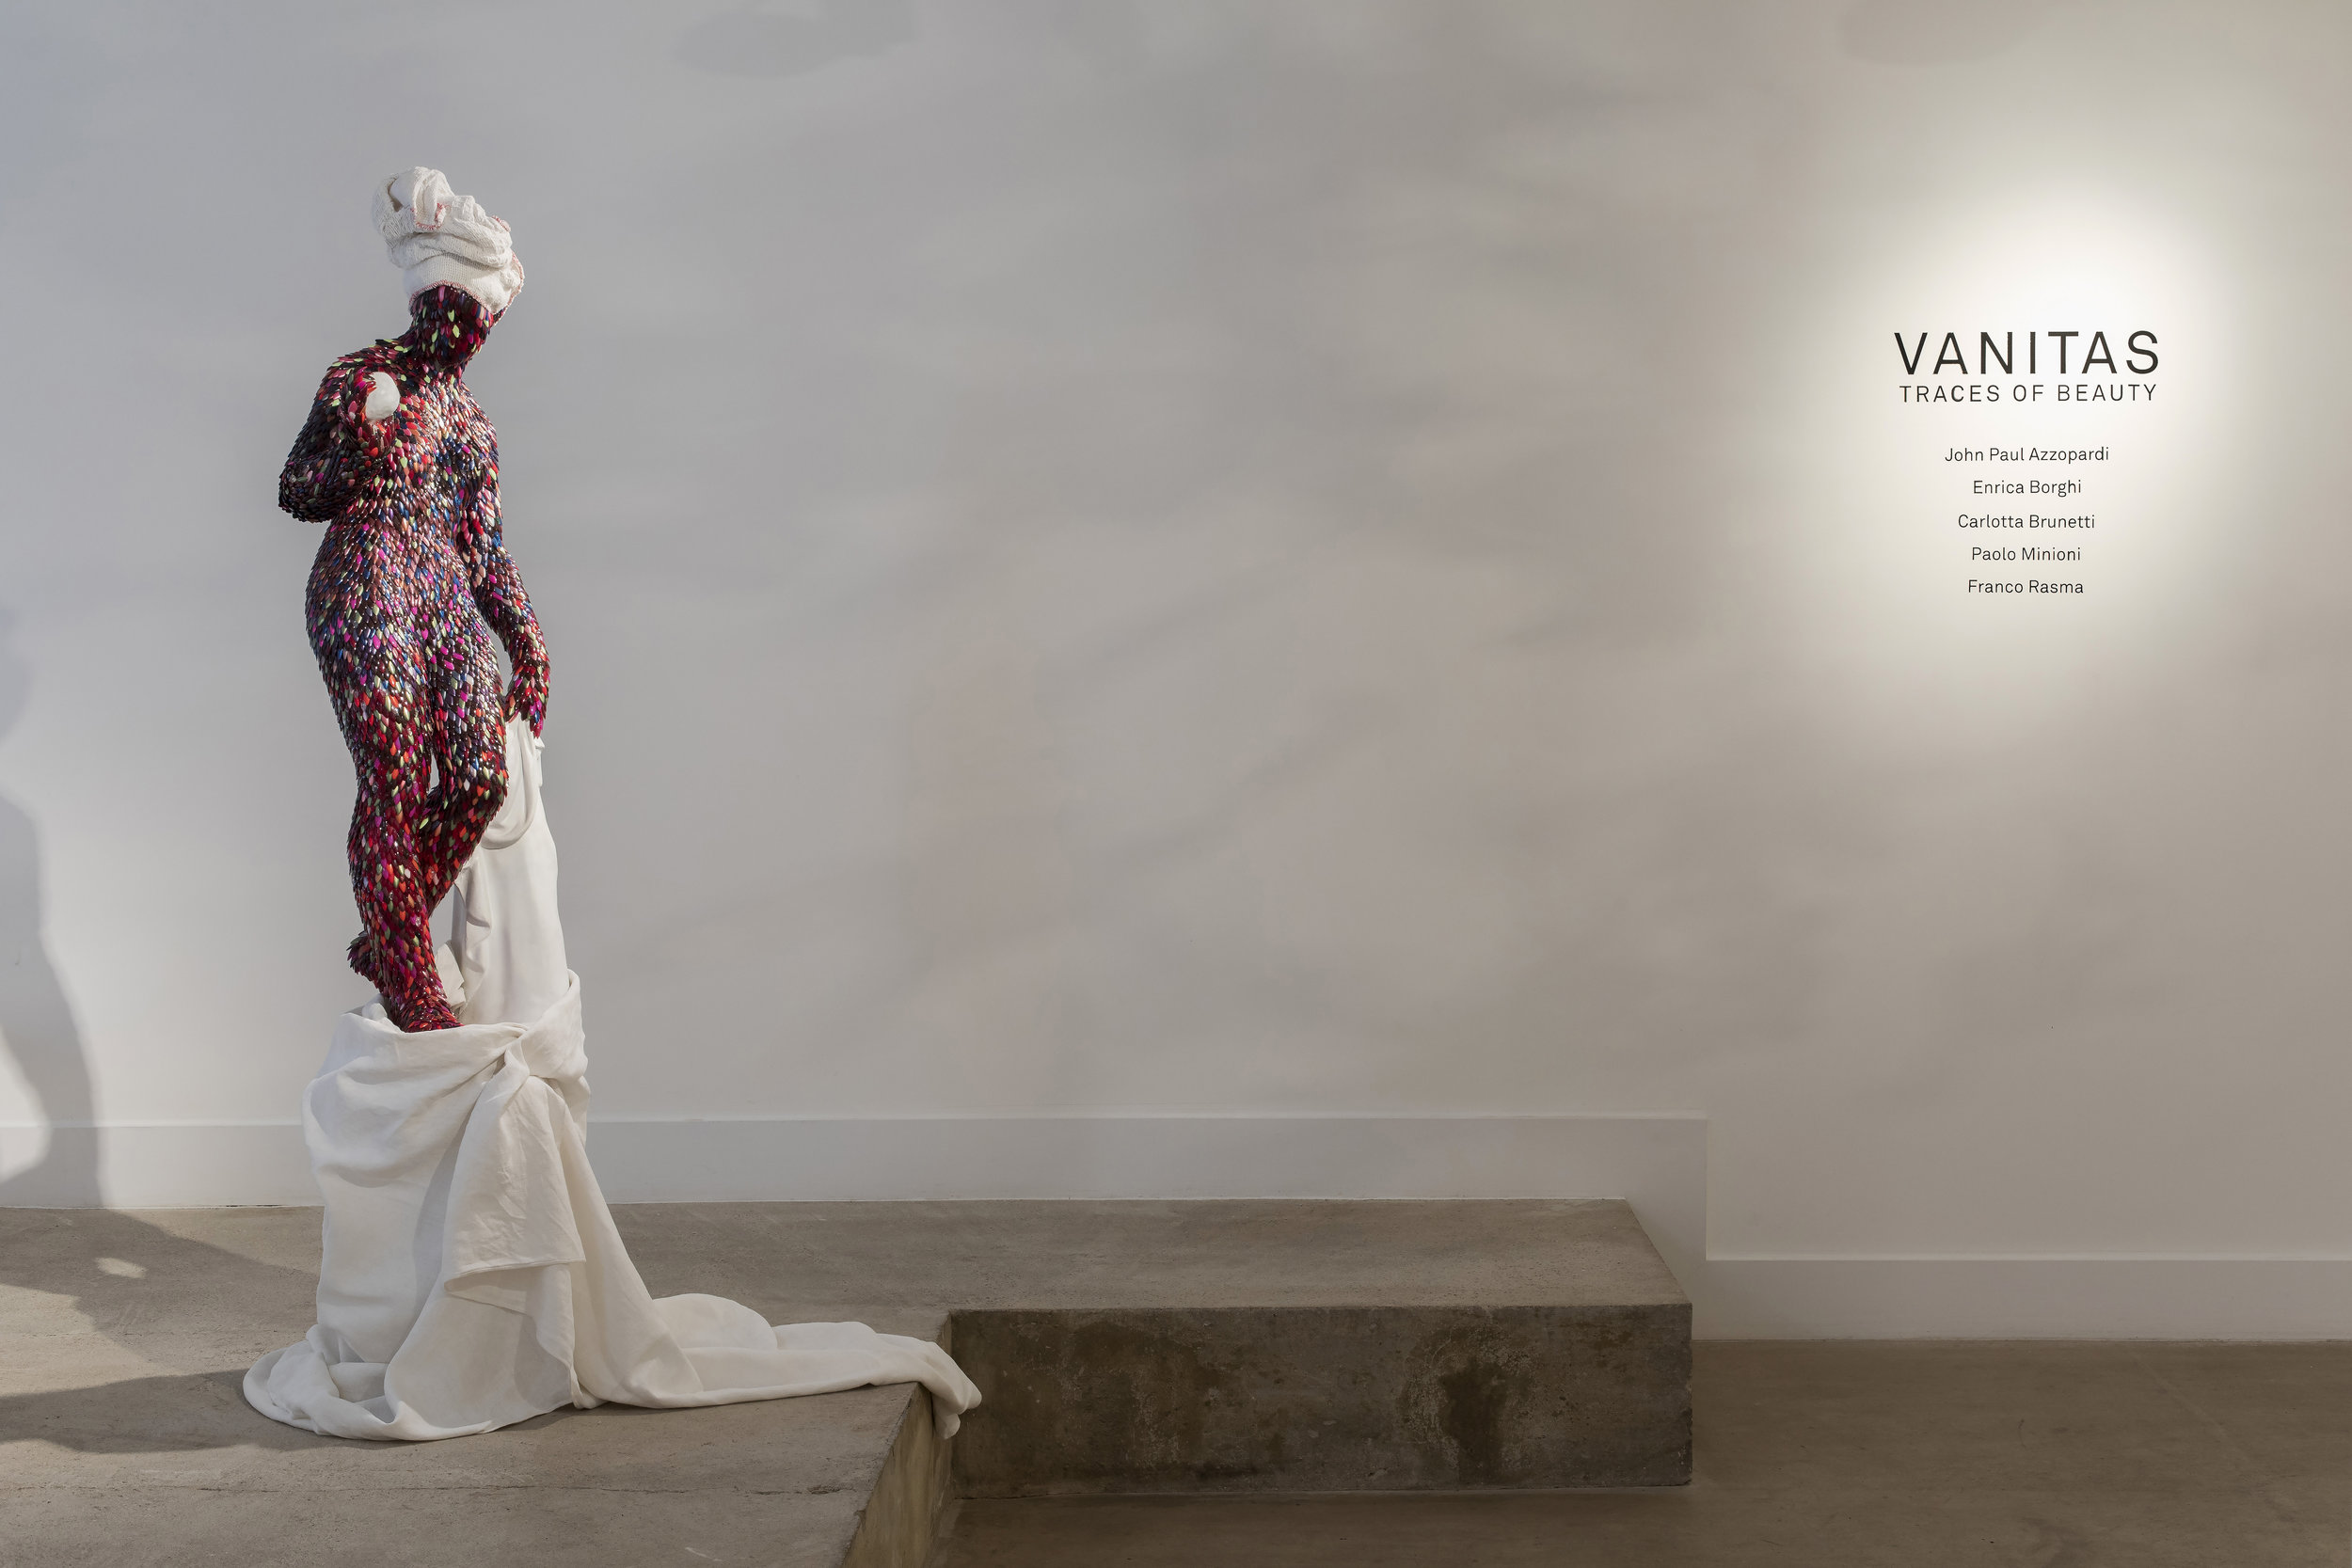 VANITAS-Traces-of-beauty-Installation-views-No-20_1.jpg